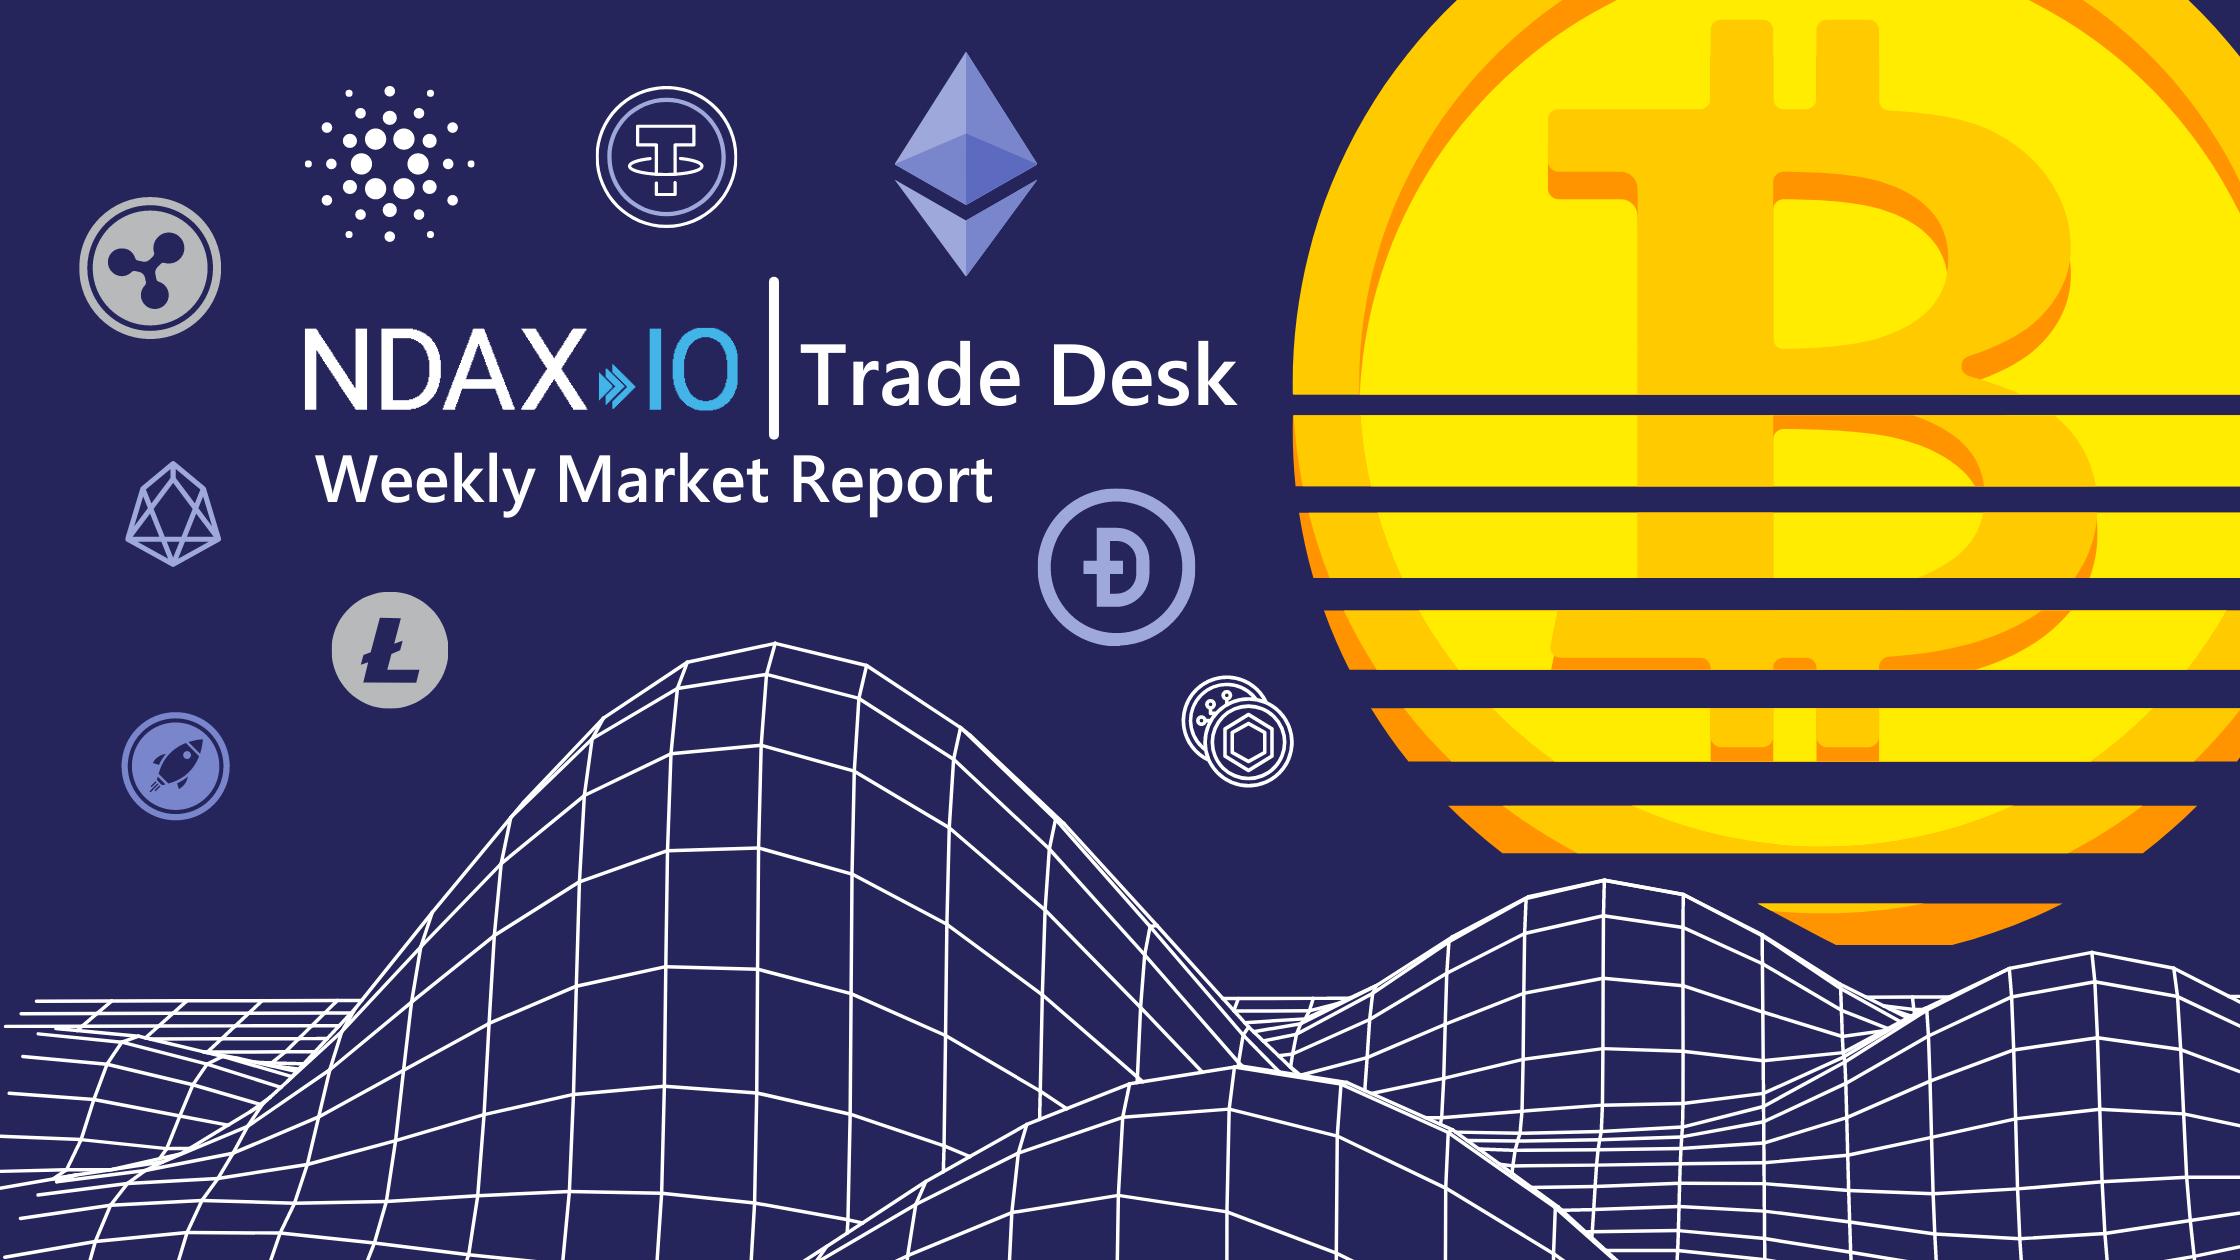 Weekly Market Report: September 3, 2021